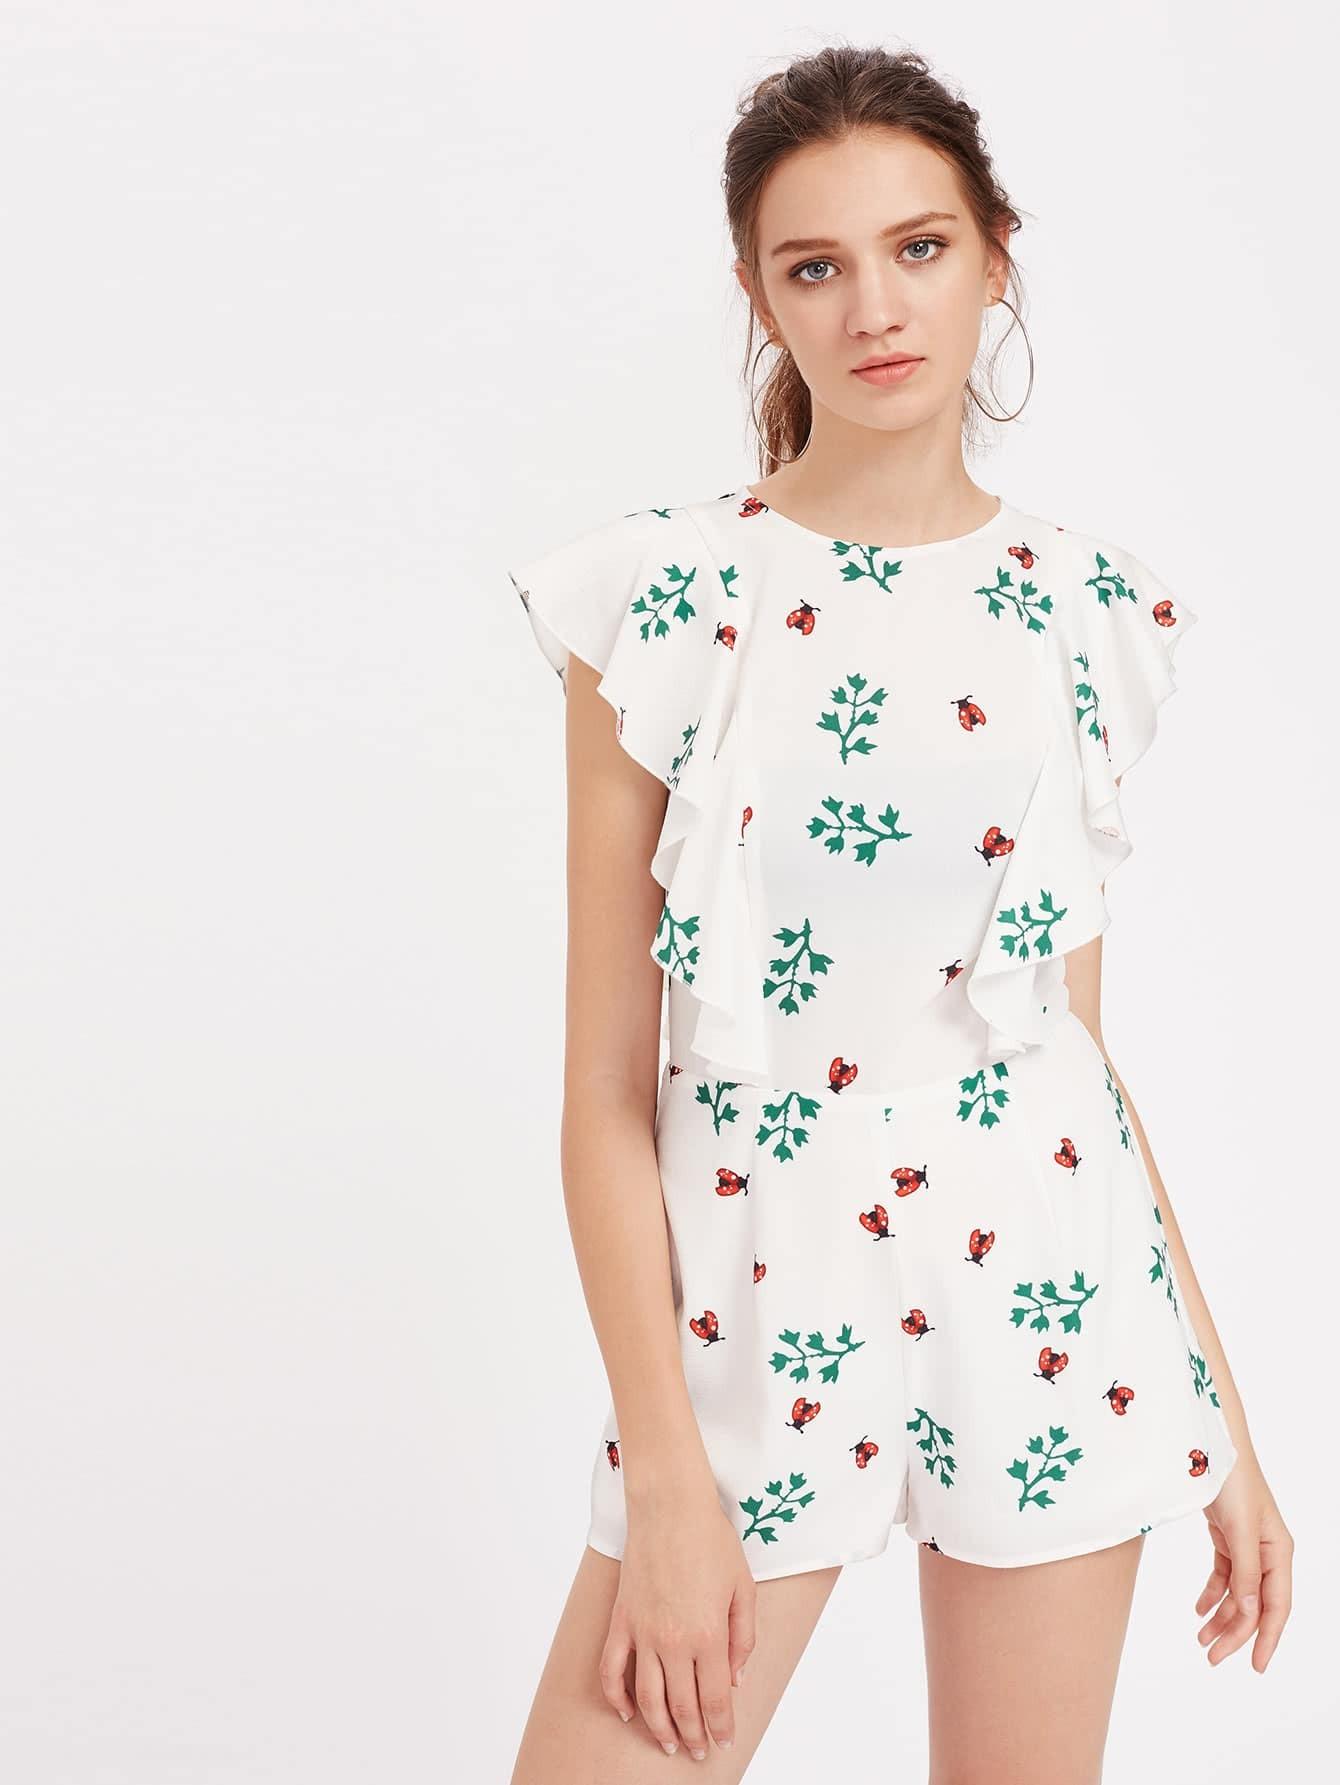 Ladybug Print Flutter Sleeve Tailored Romper embroidered flutter sleeve self belt romper